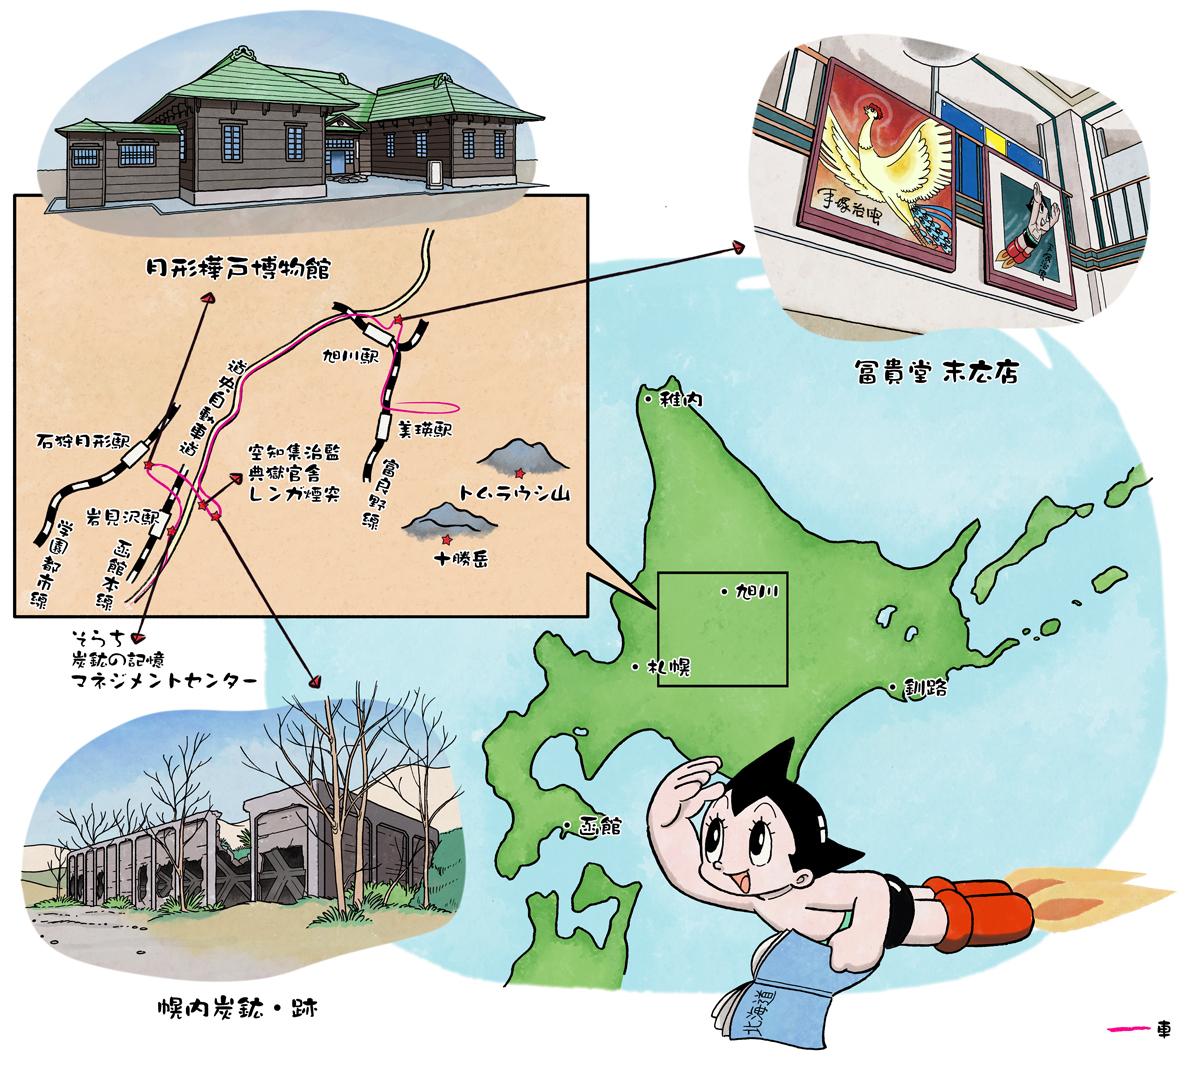 Category:阿部氏 (page 2) - Jap...